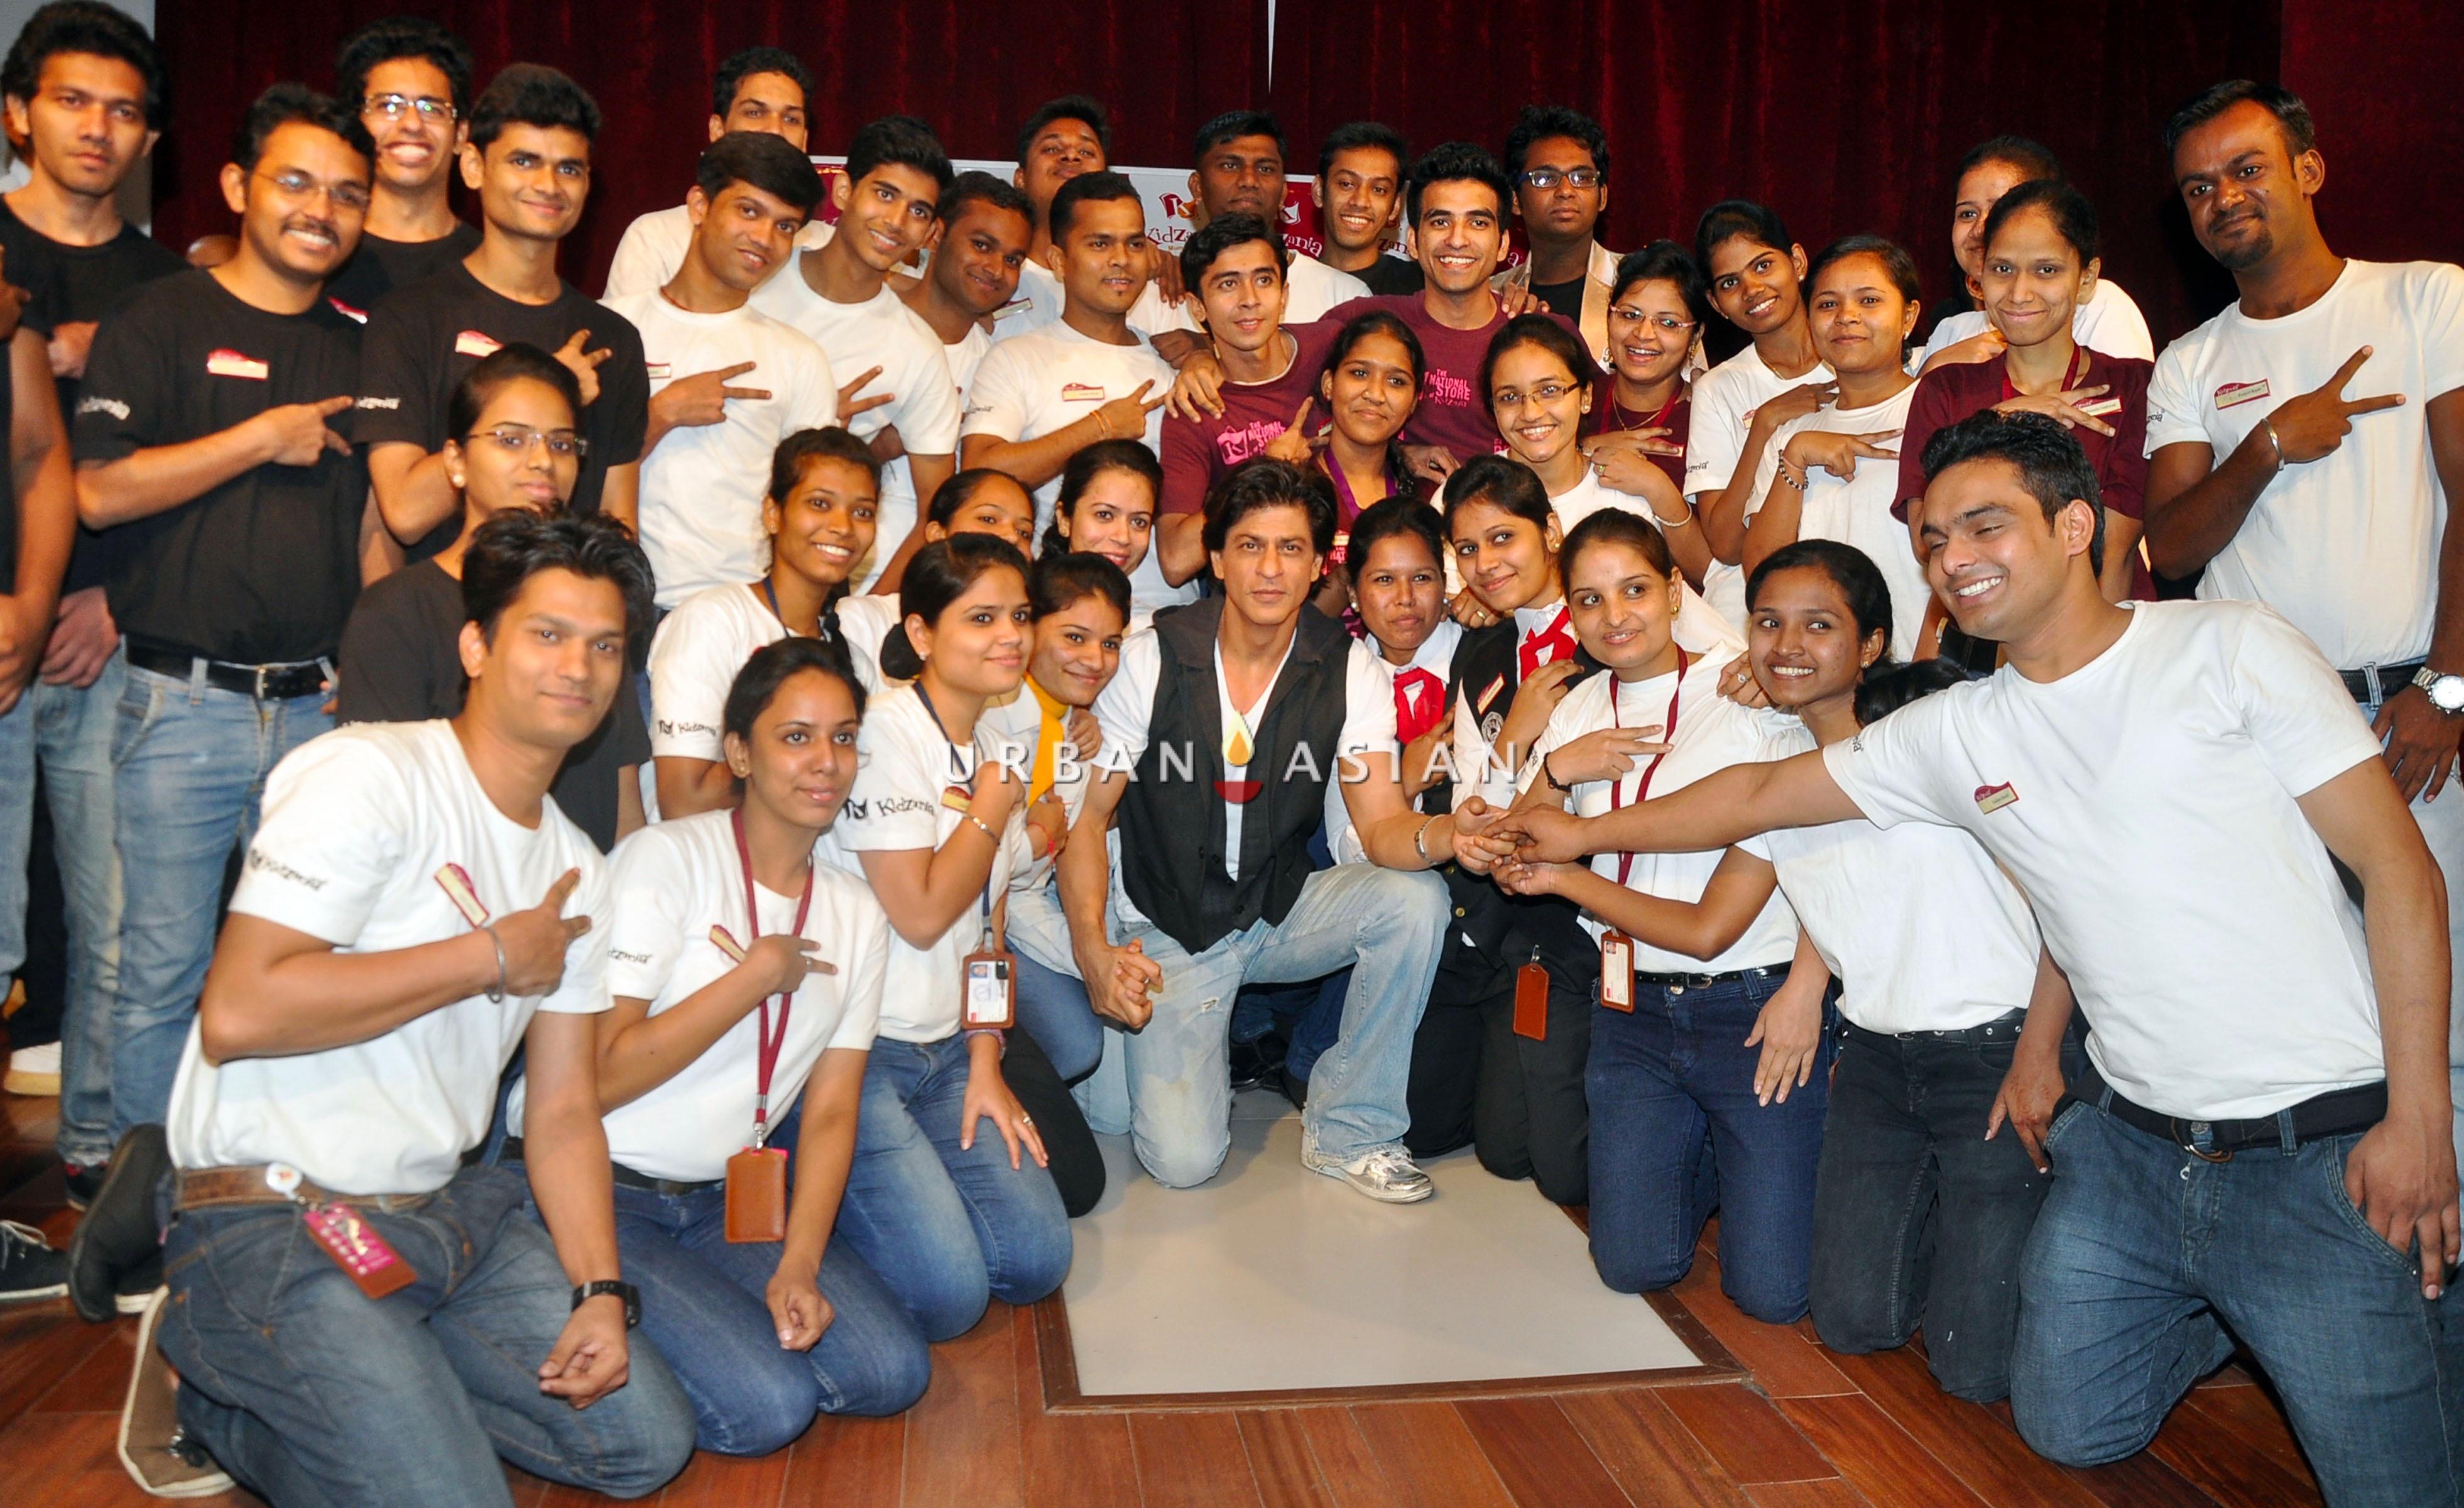 SRK AT KIDZANIA DSC_6507